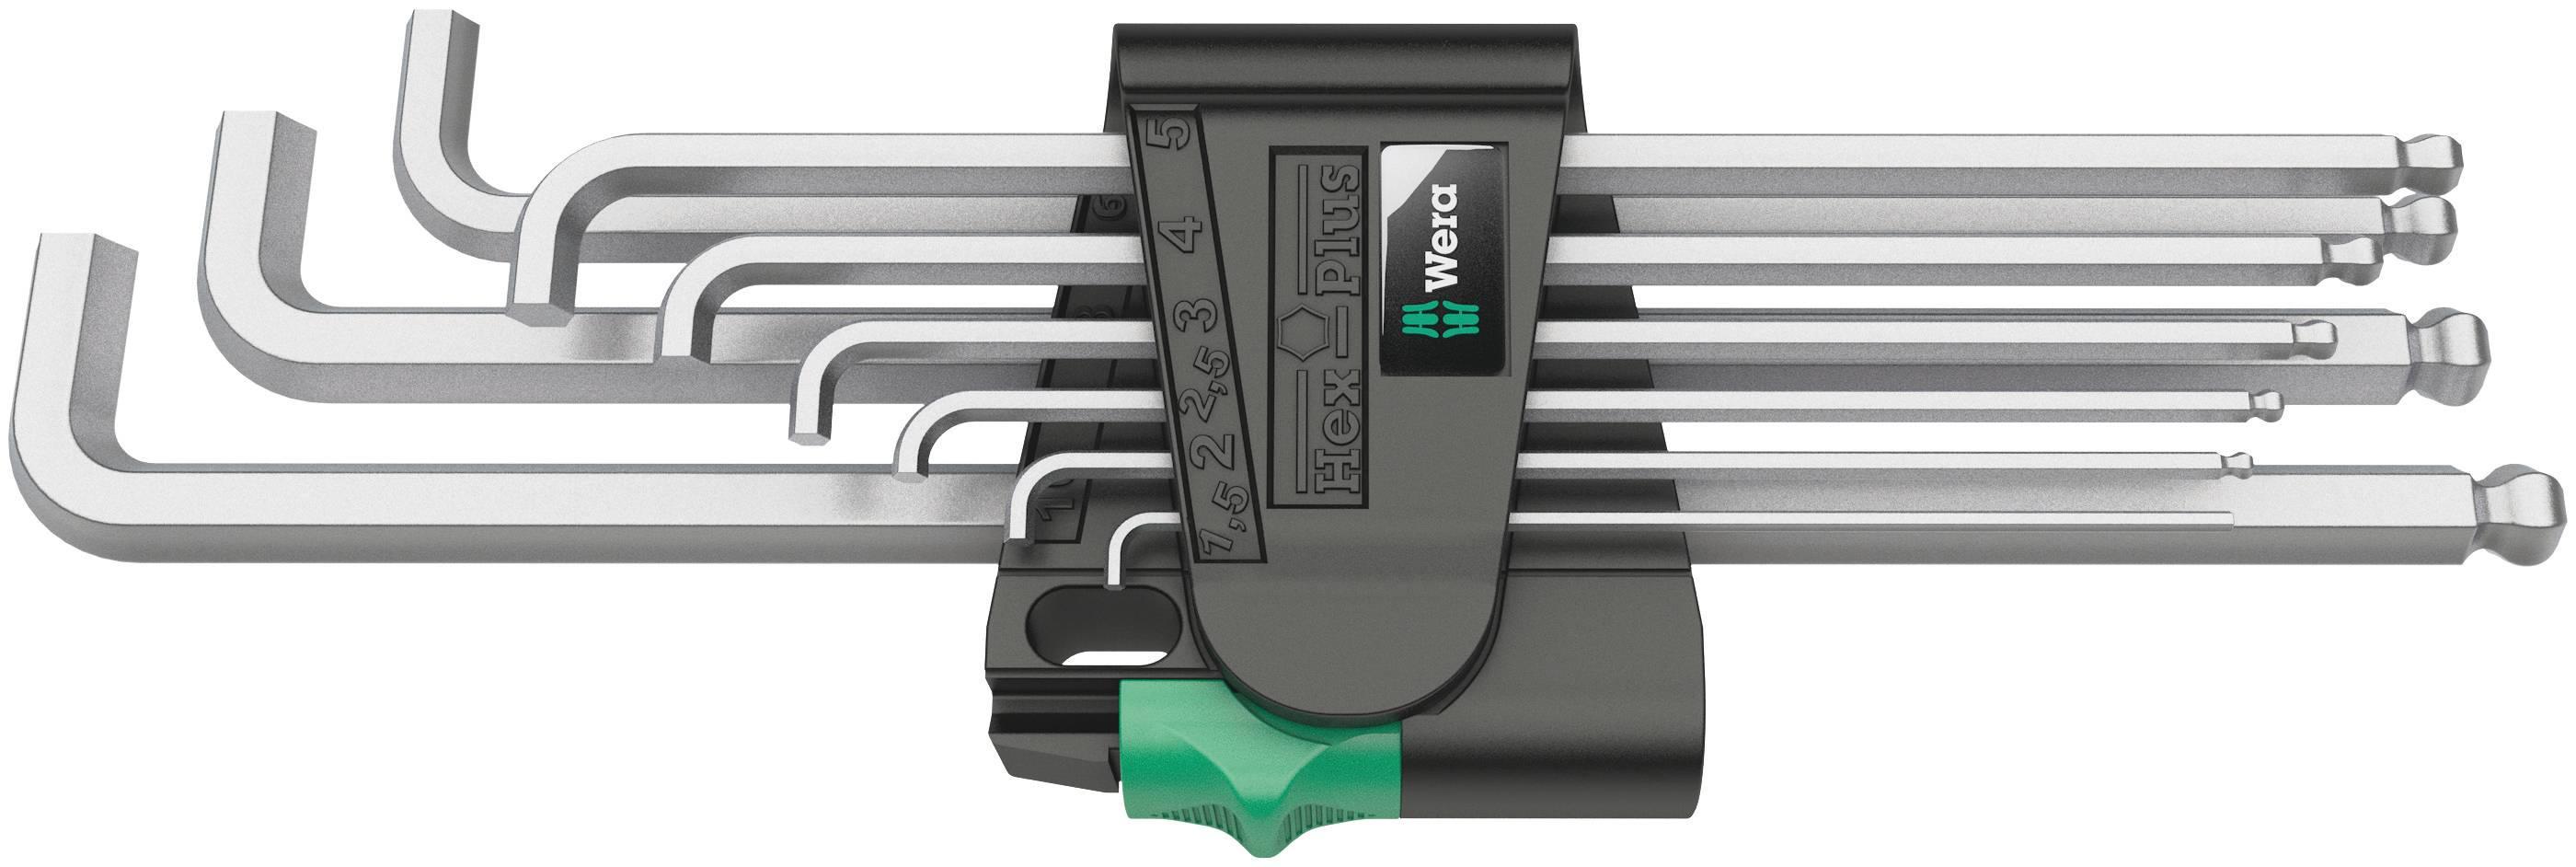 Sada imbusových kľúčov Wera 05073594001, 1,5 - 10 mm, 9 ks